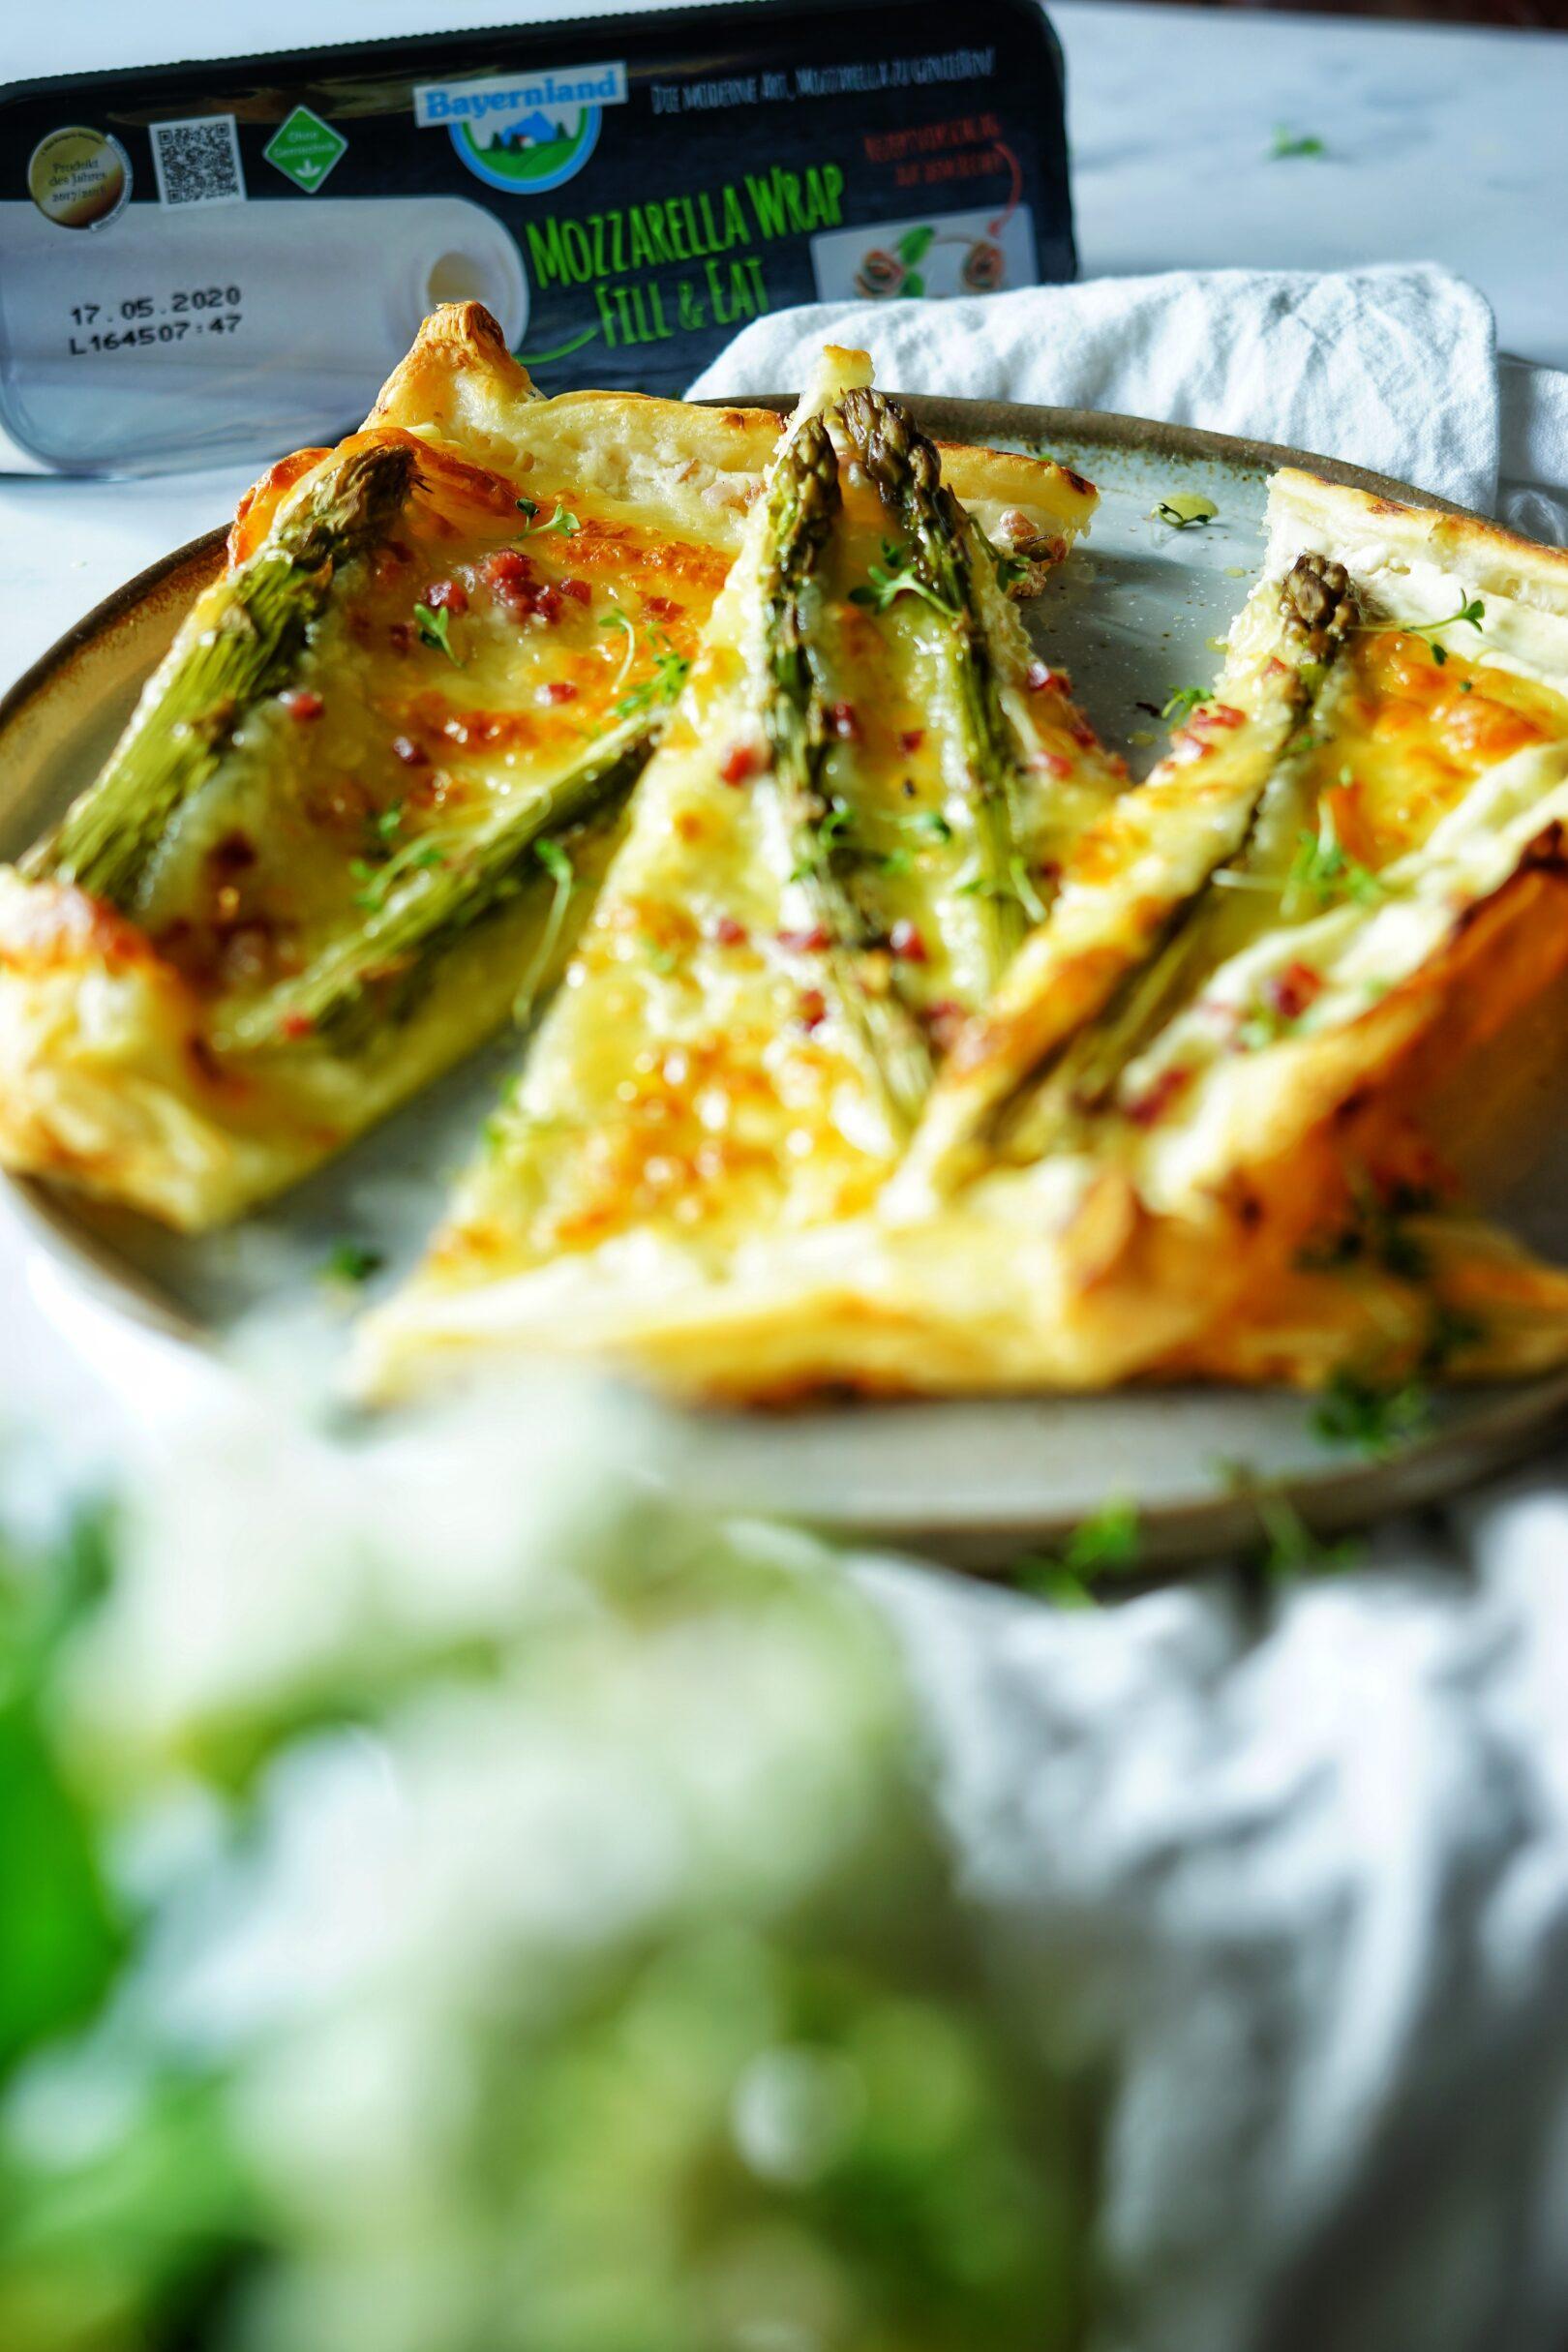 Mozzarella Wrap mit grünen Spargel